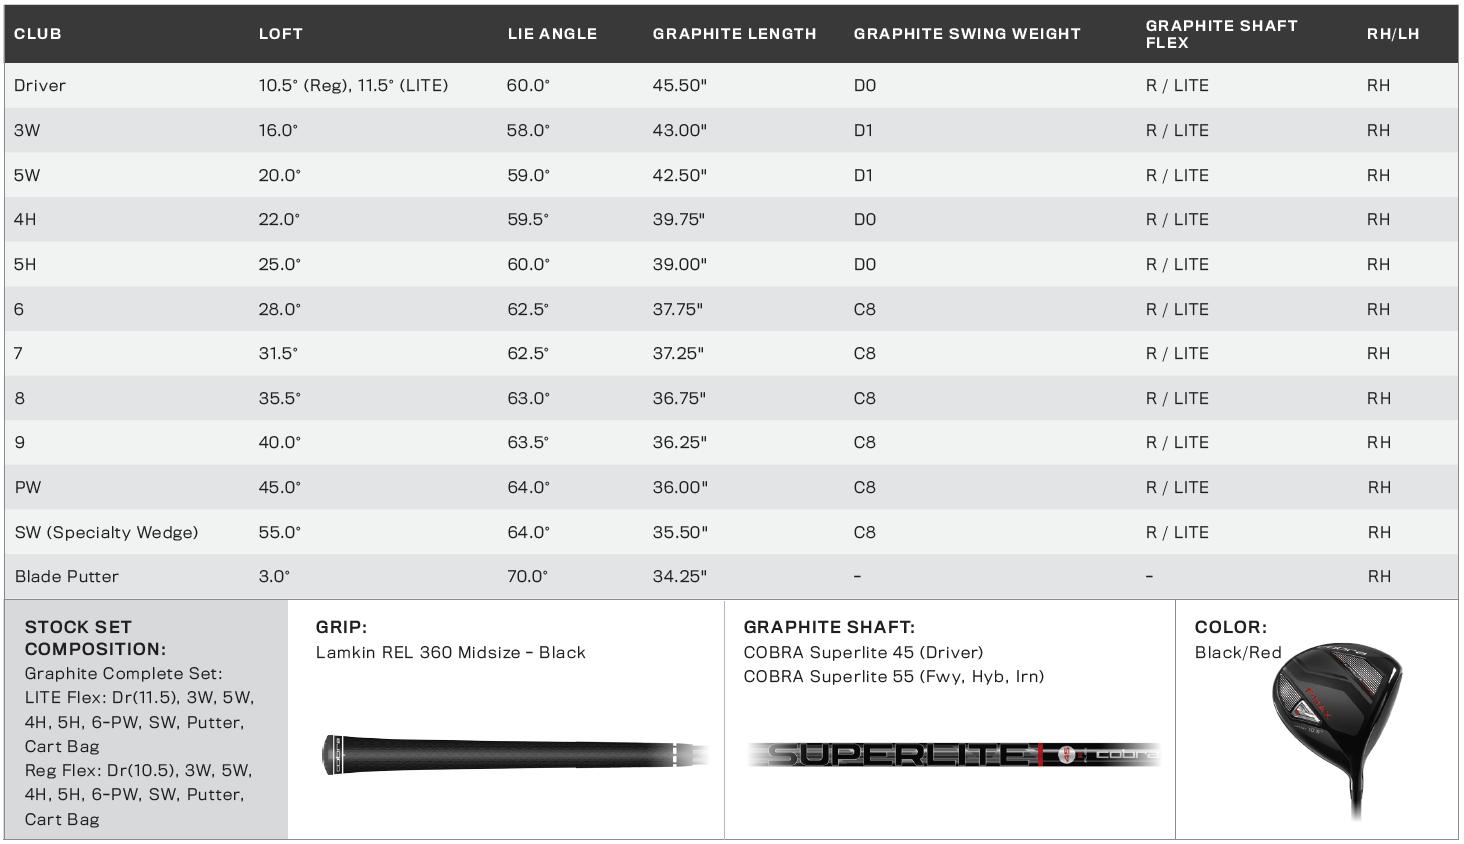 Cobra F-Max Superlite Complete Set Tech Specs